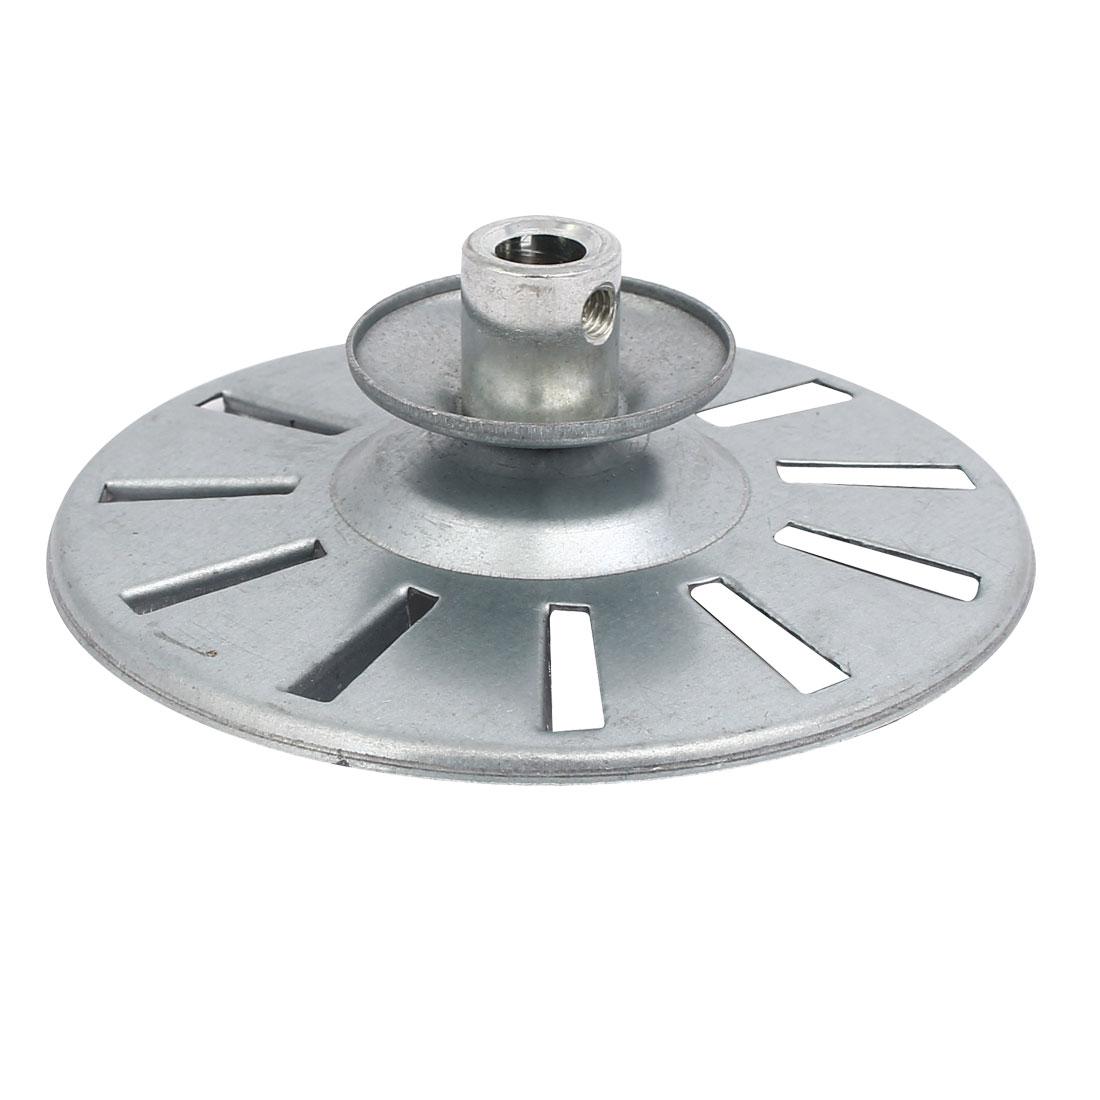 113mm x 40mm Metal Washing Machine Drive Pulley Wheel Silver Tone